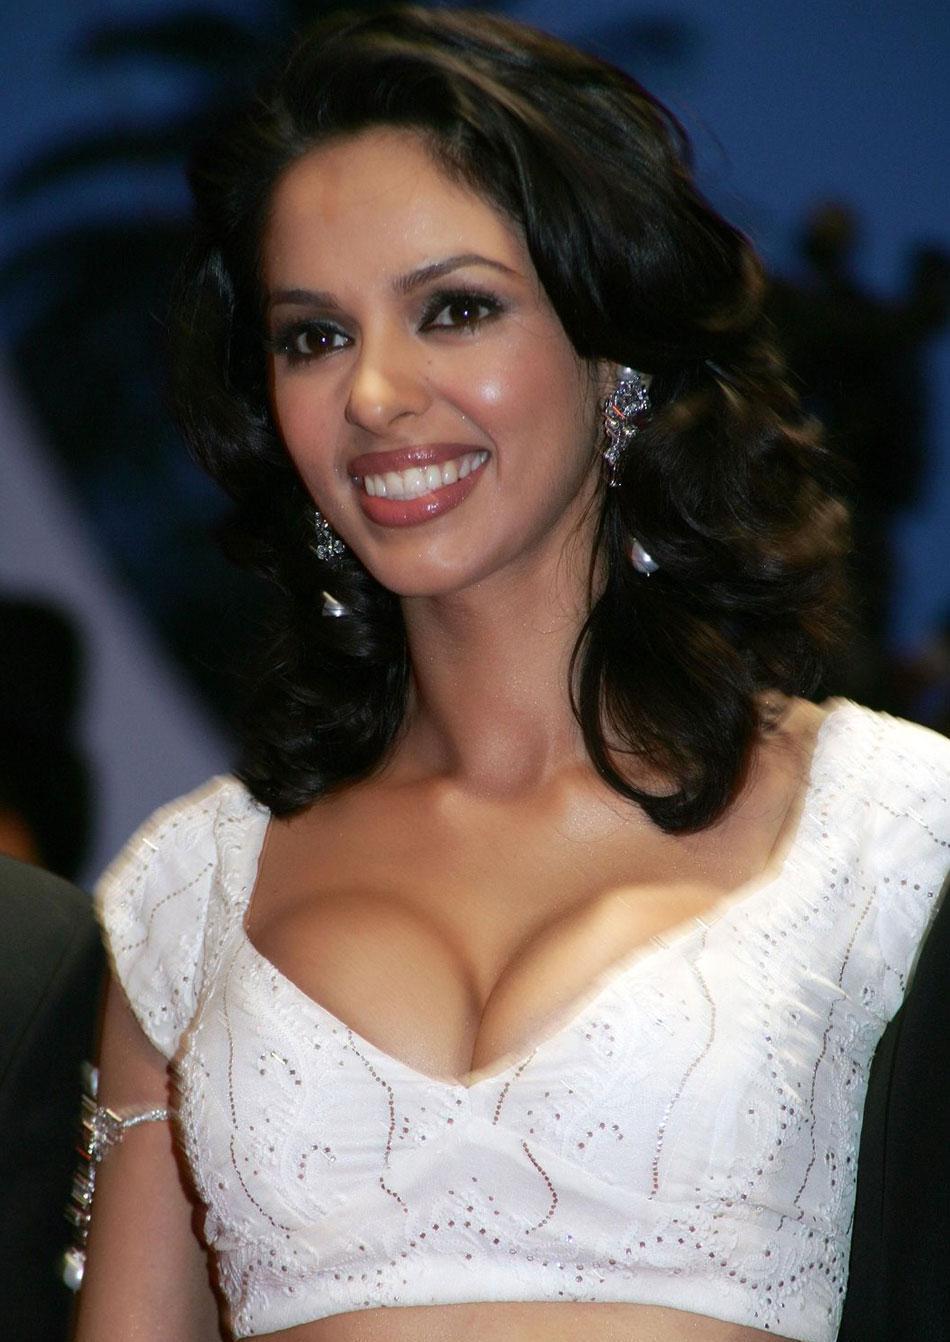 Relationship Conundrums Celebrity News Mallika Sherawat - The Sexy Girl-4460